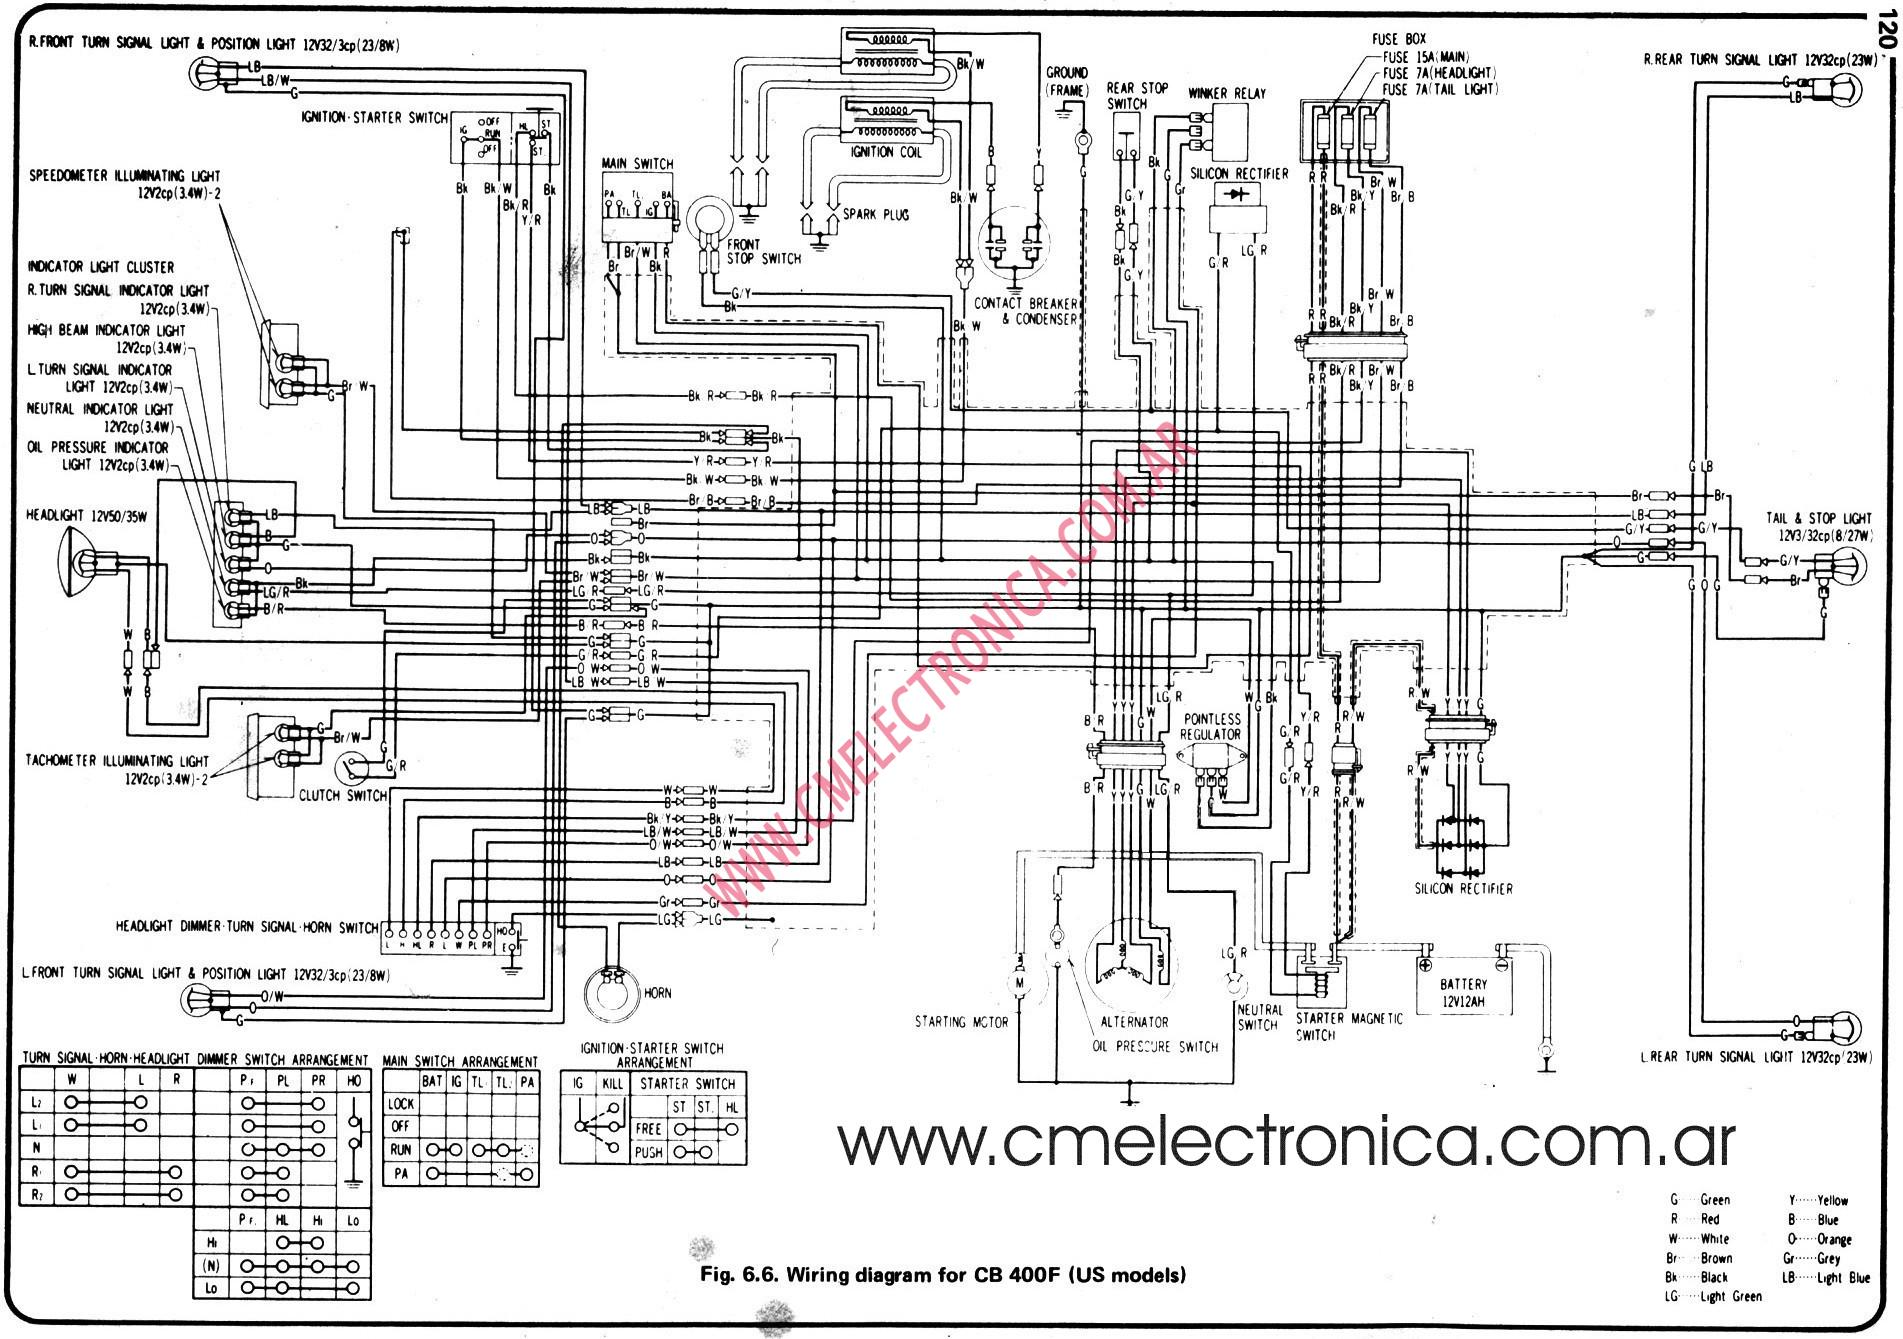 hight resolution of cb400f wiring diagram pdf automotive wiring diagrams 95 nissan pickup wiring diagram cb400f wiring diagram pdf